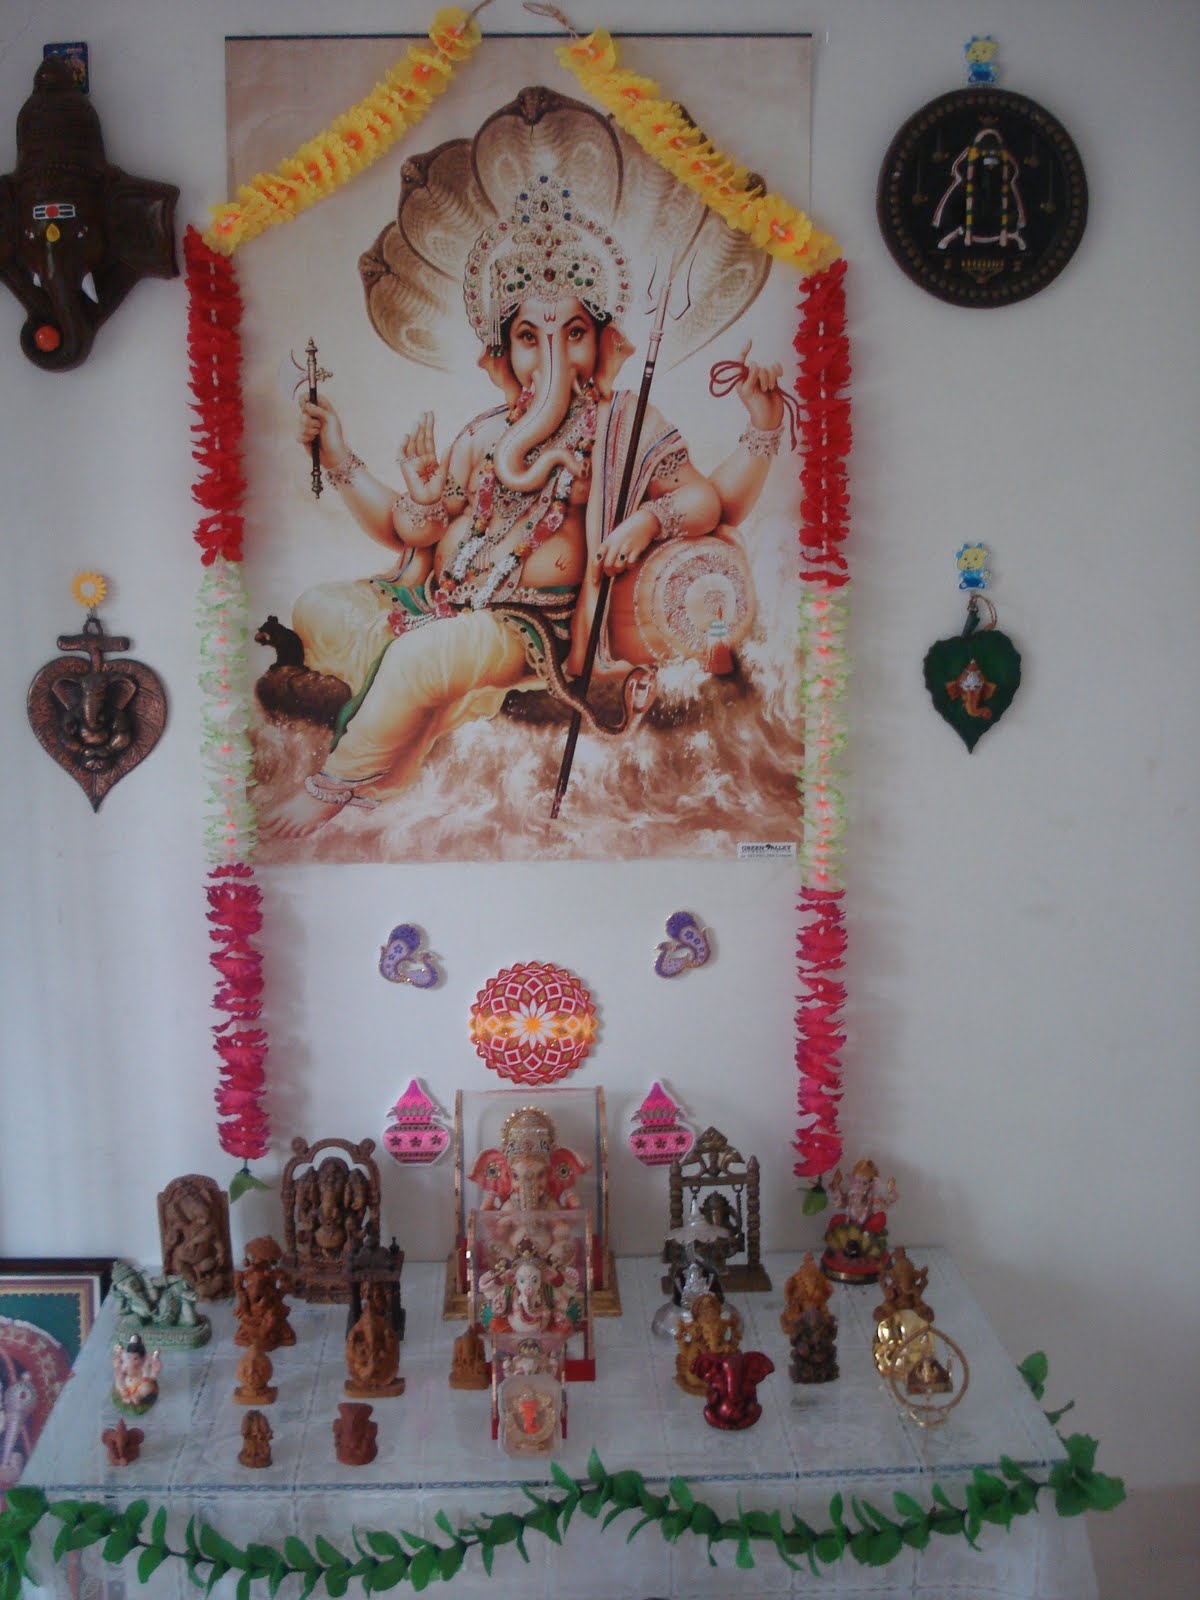 Ganapati Bappa Moraya... Mangala Moorthy Moraya